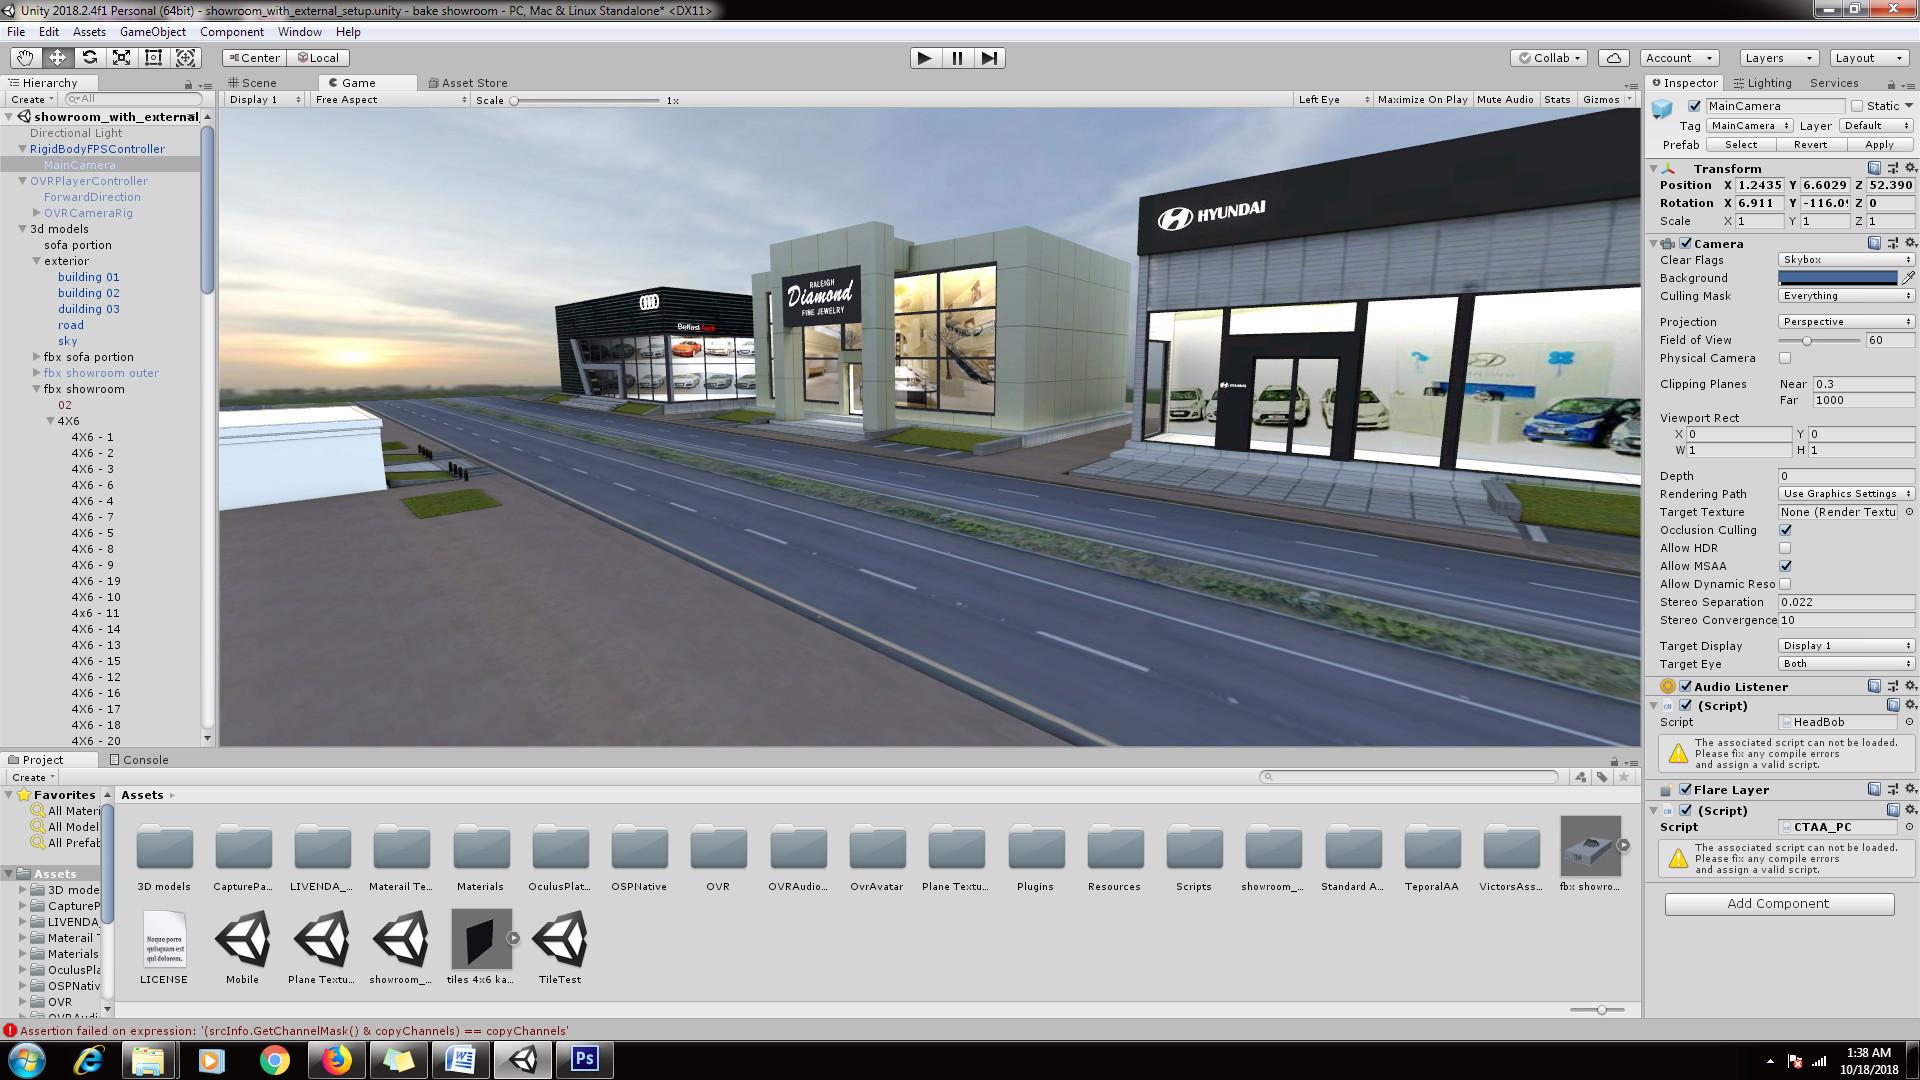 Naveen Verma - For VR Light Bake in Max Setup in Unity (Work